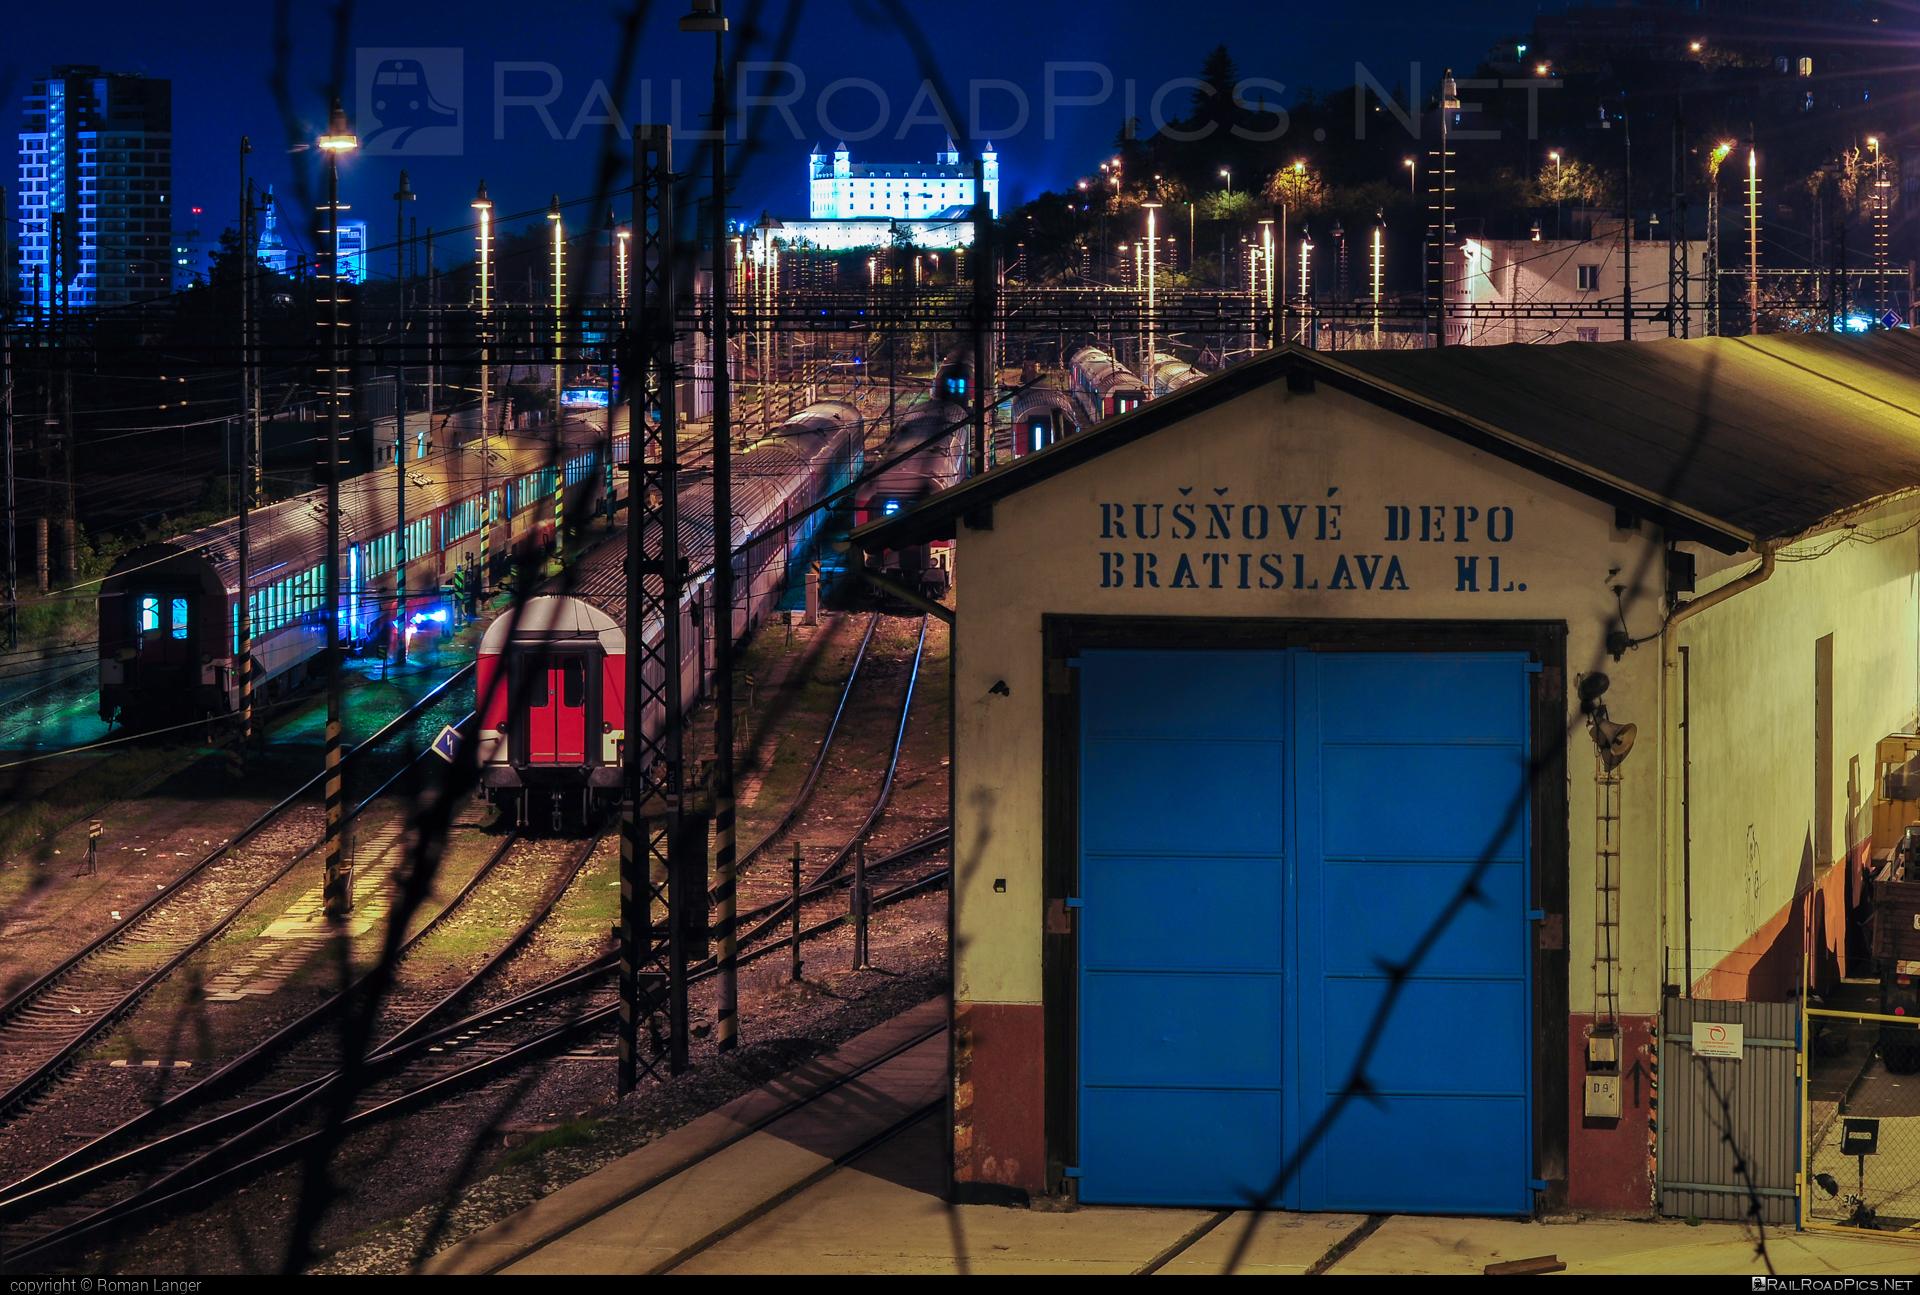 Bratislava-Hlavné locomotive depot location overview #bratislavahlavnedepot #depotbratislavahlavne